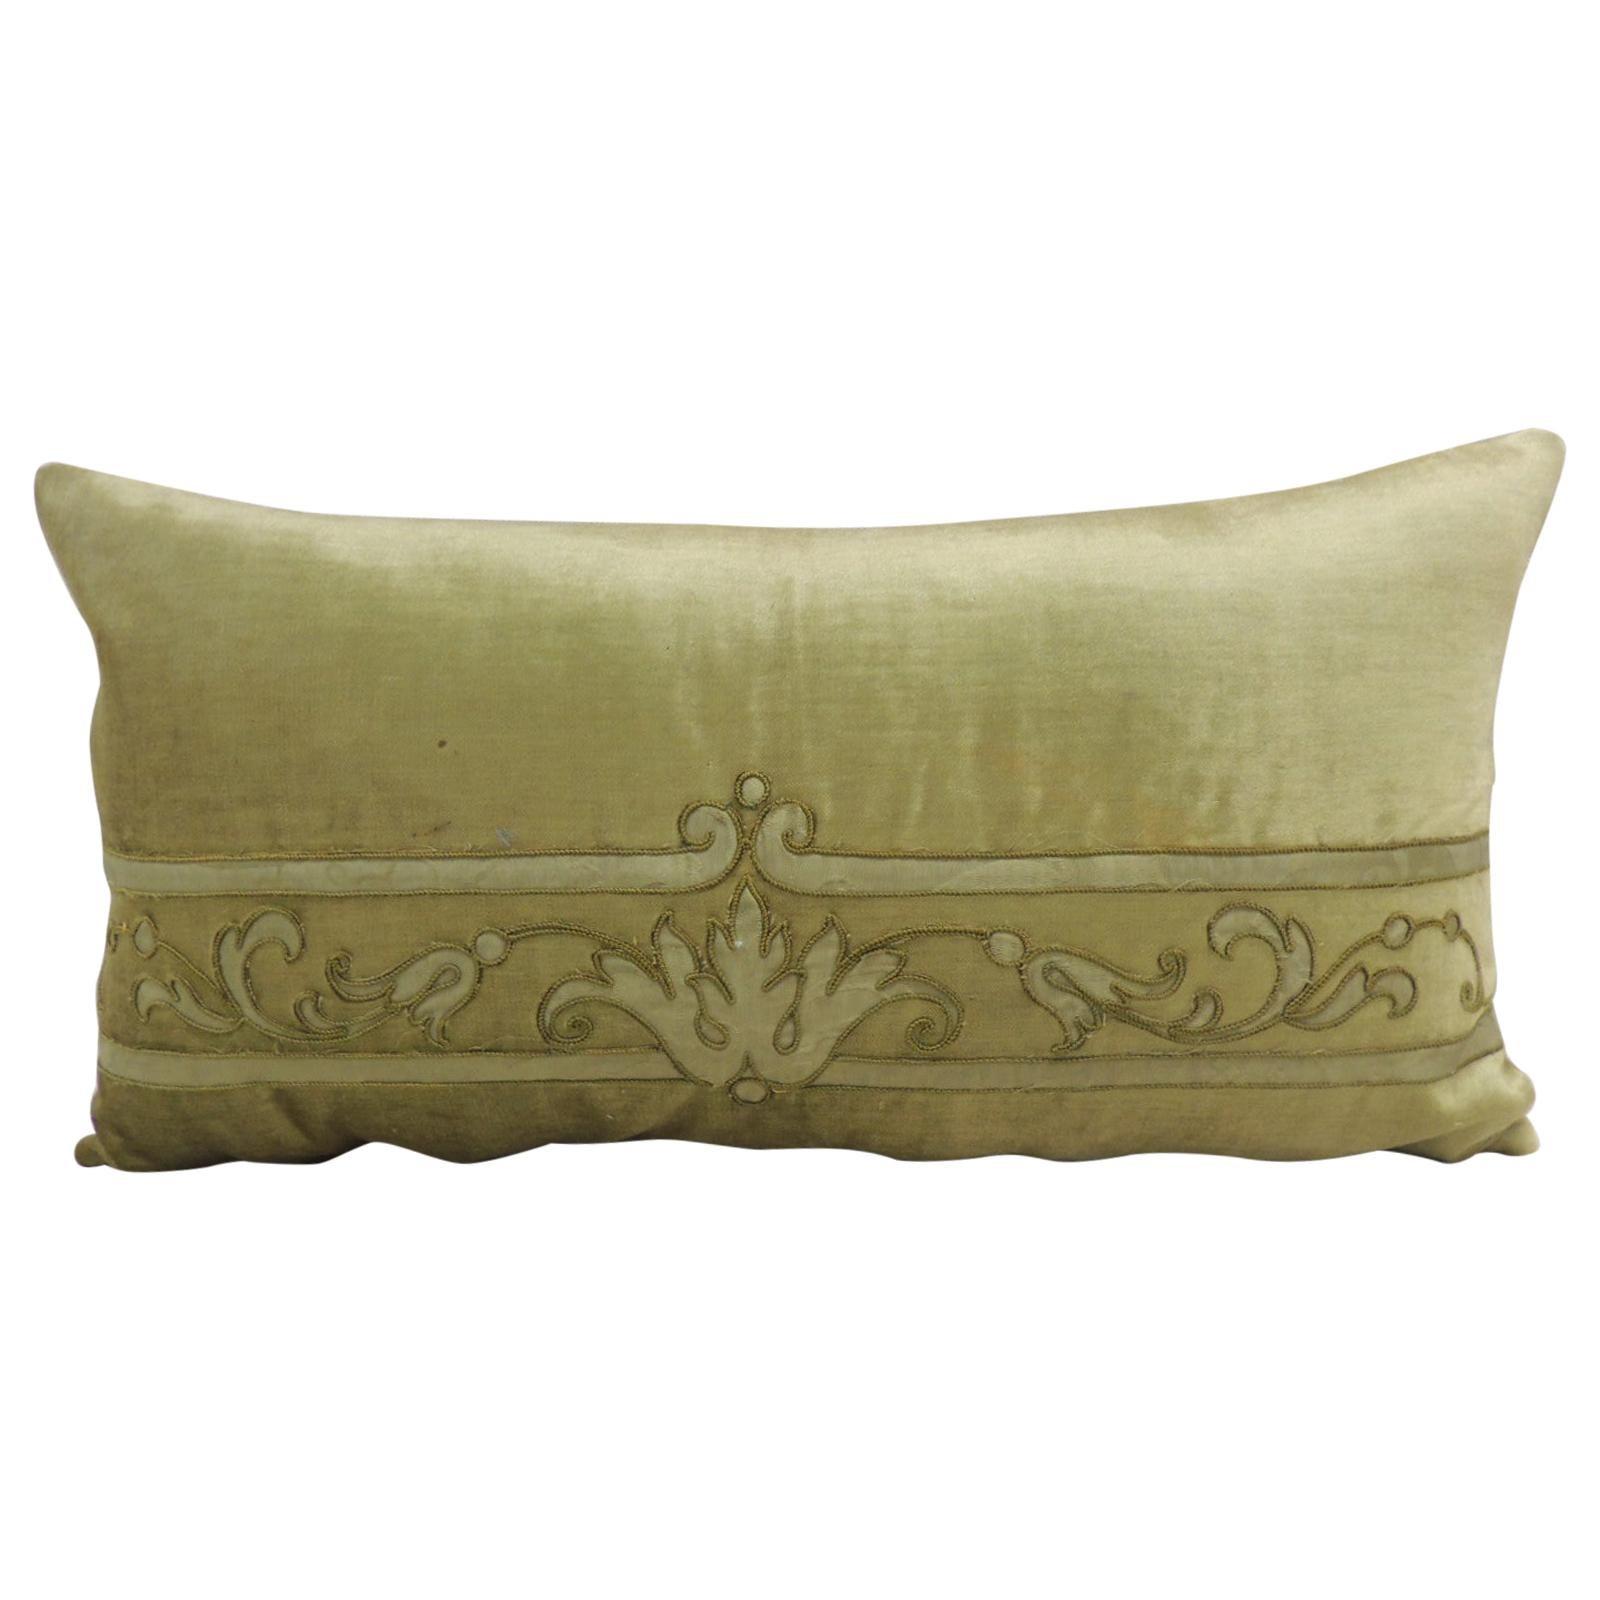 Antique Silk Velvet Olive Green Applique Decorative Long Bolster Pillow